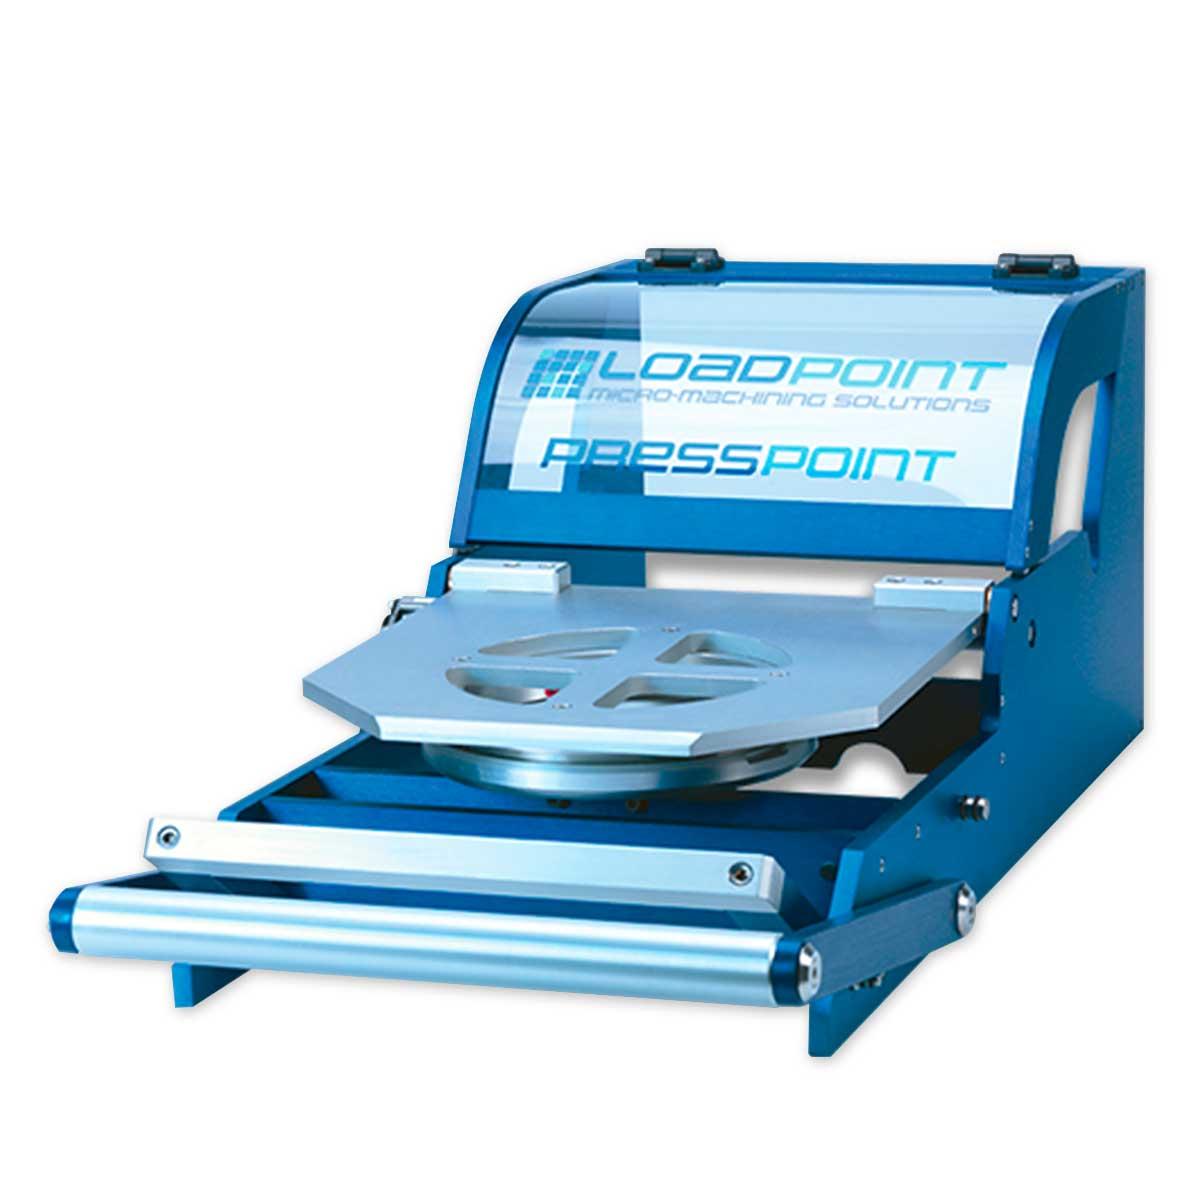 Установка дисковой резки пластин ꜛ LOADPOINT Presspoint